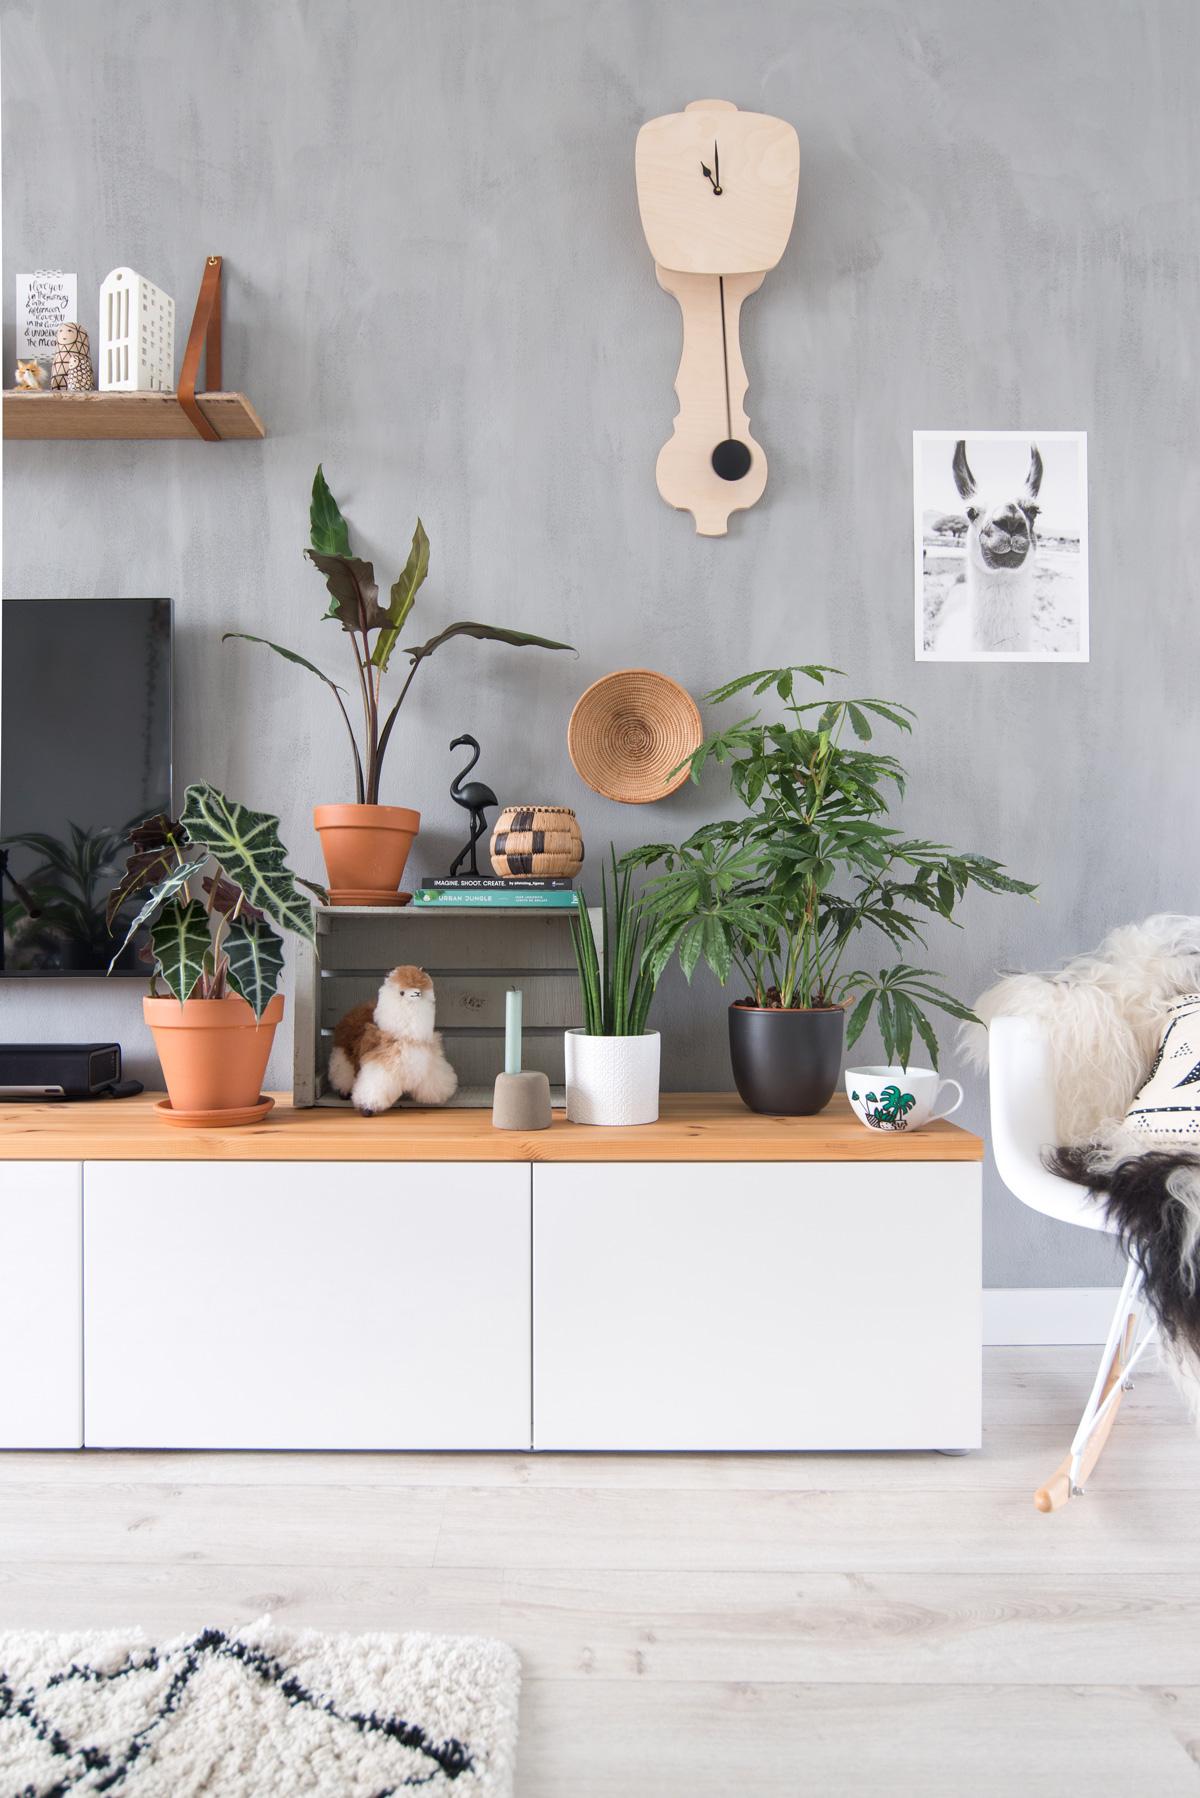 keeelly91blog urbanjungle intratuin planten groen in huis groenevingers interieur houseplant green woonkamer